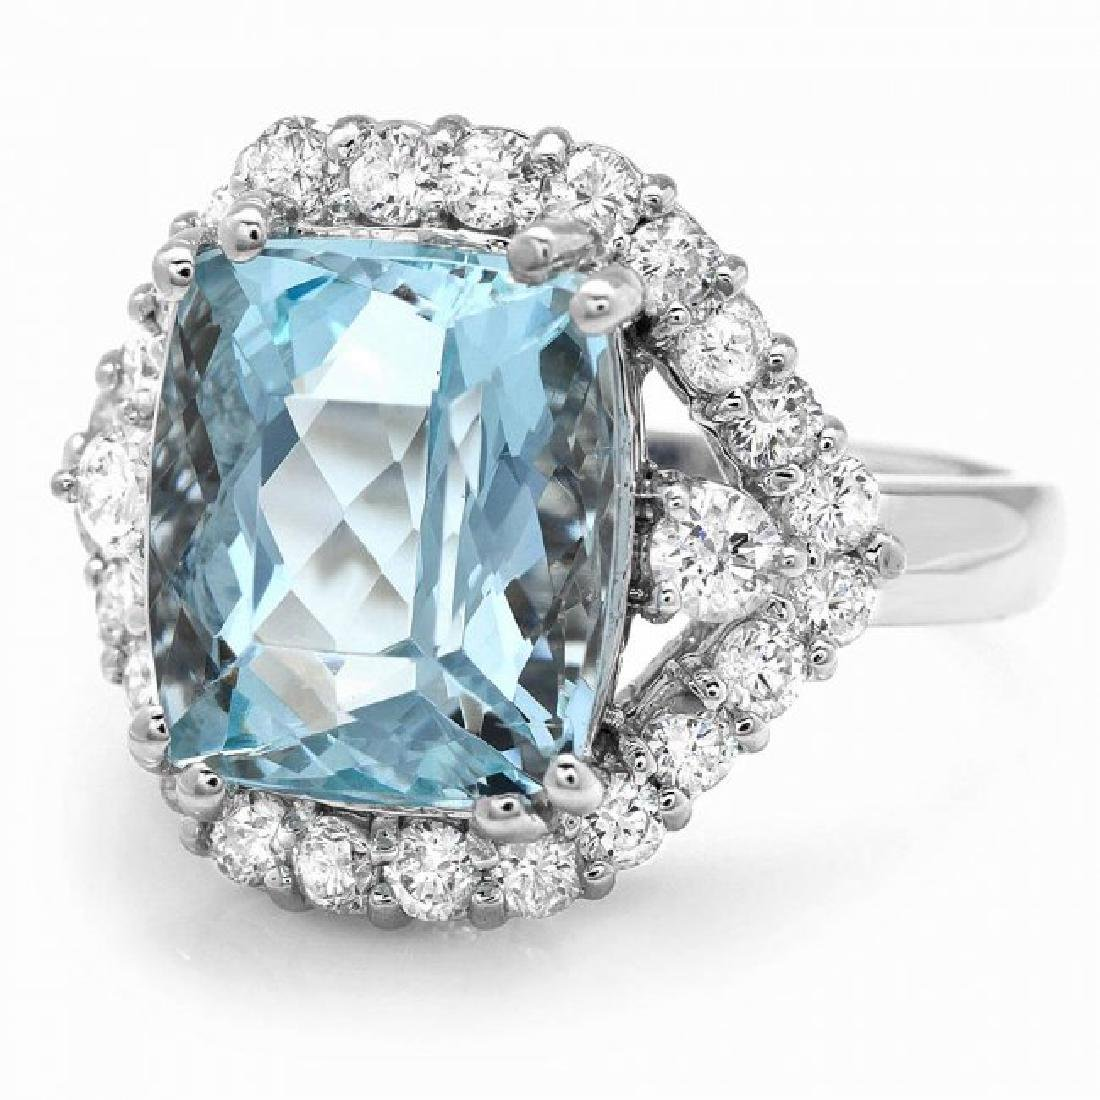 14k Gold 5.00ct Aquamarine 1.00ct Diamond Ring - 3